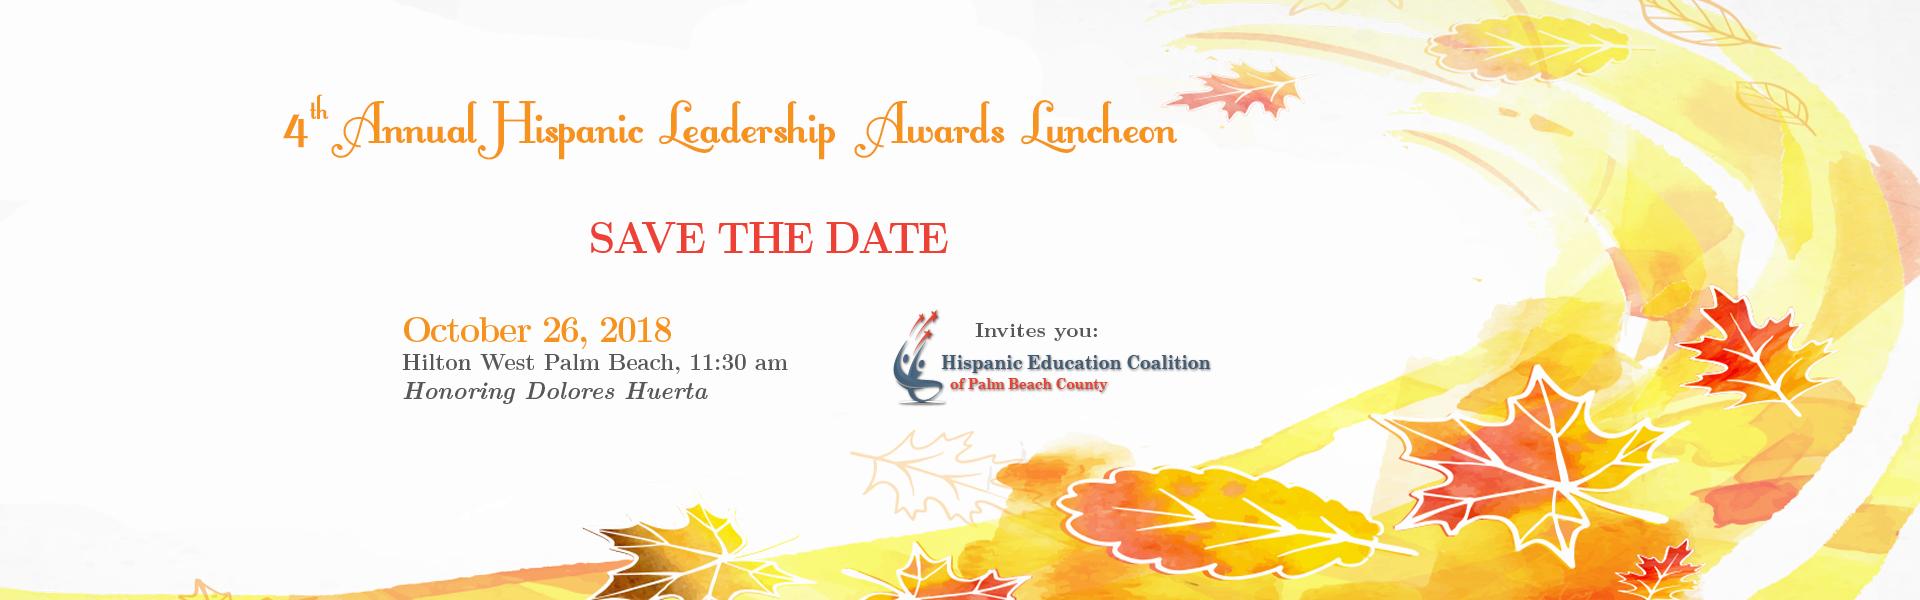 4th Annual Hispanic Leadership Awards Luncheon